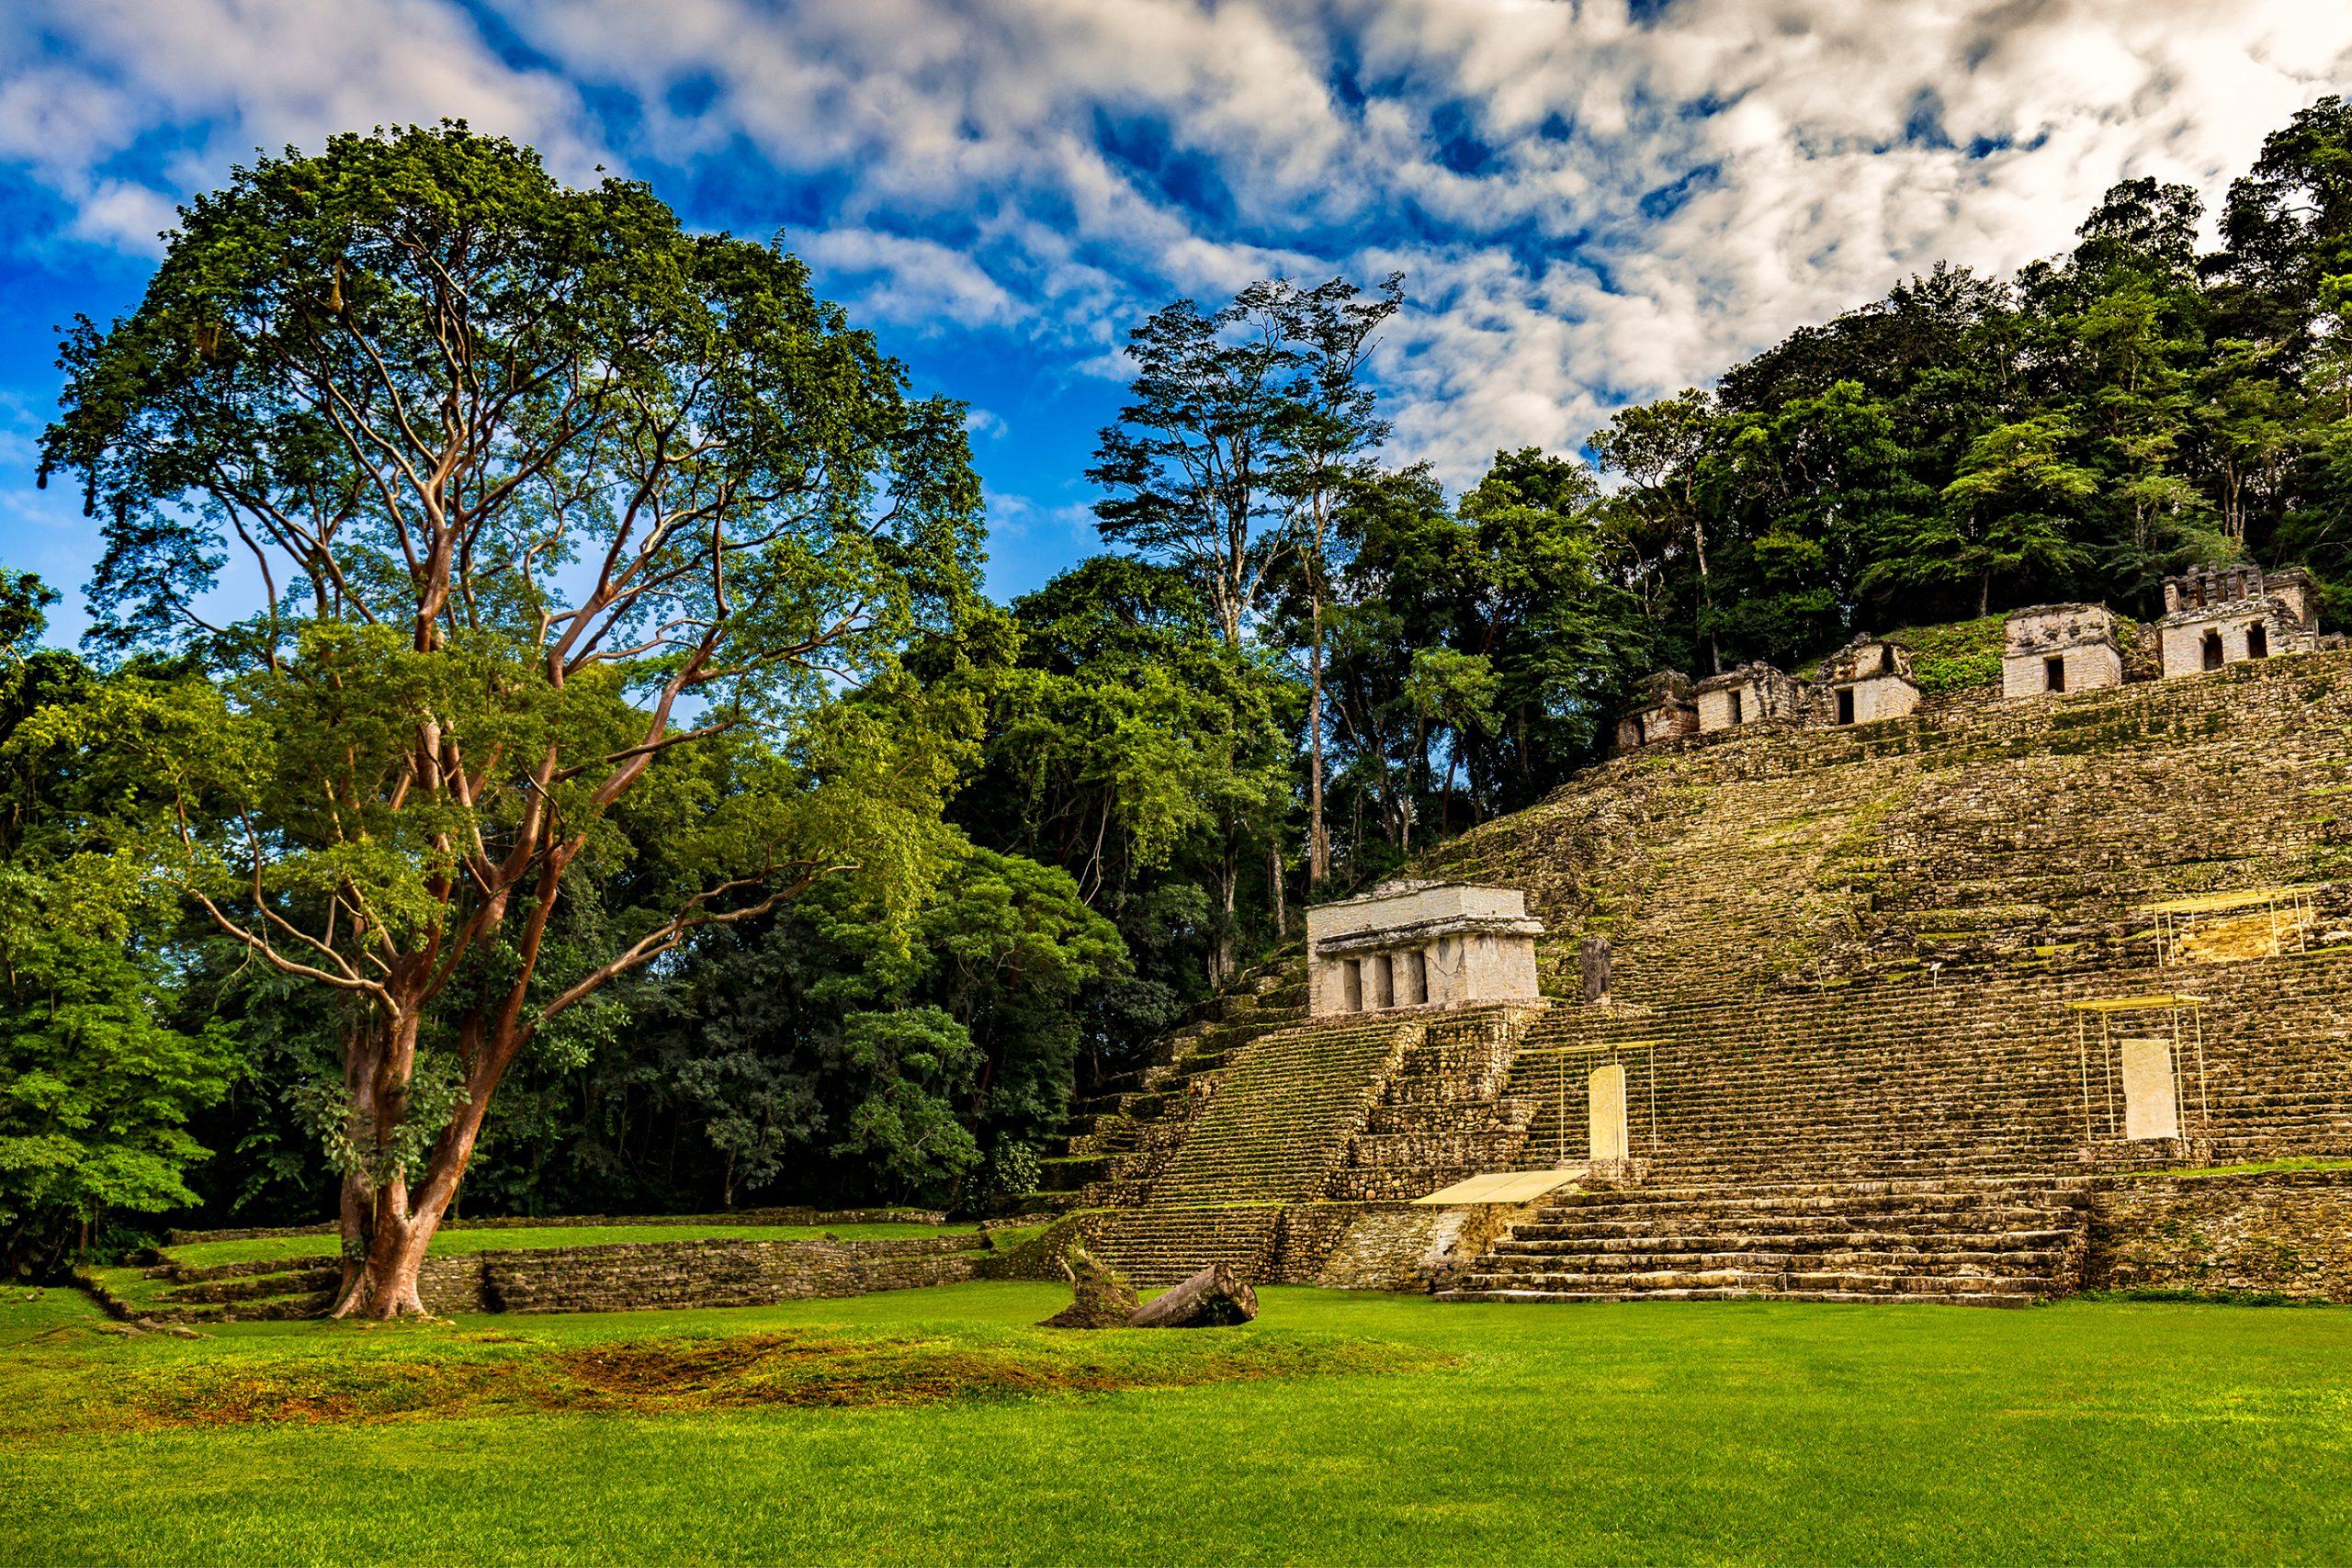 Yaxchillán y Bonampak en Chiapas